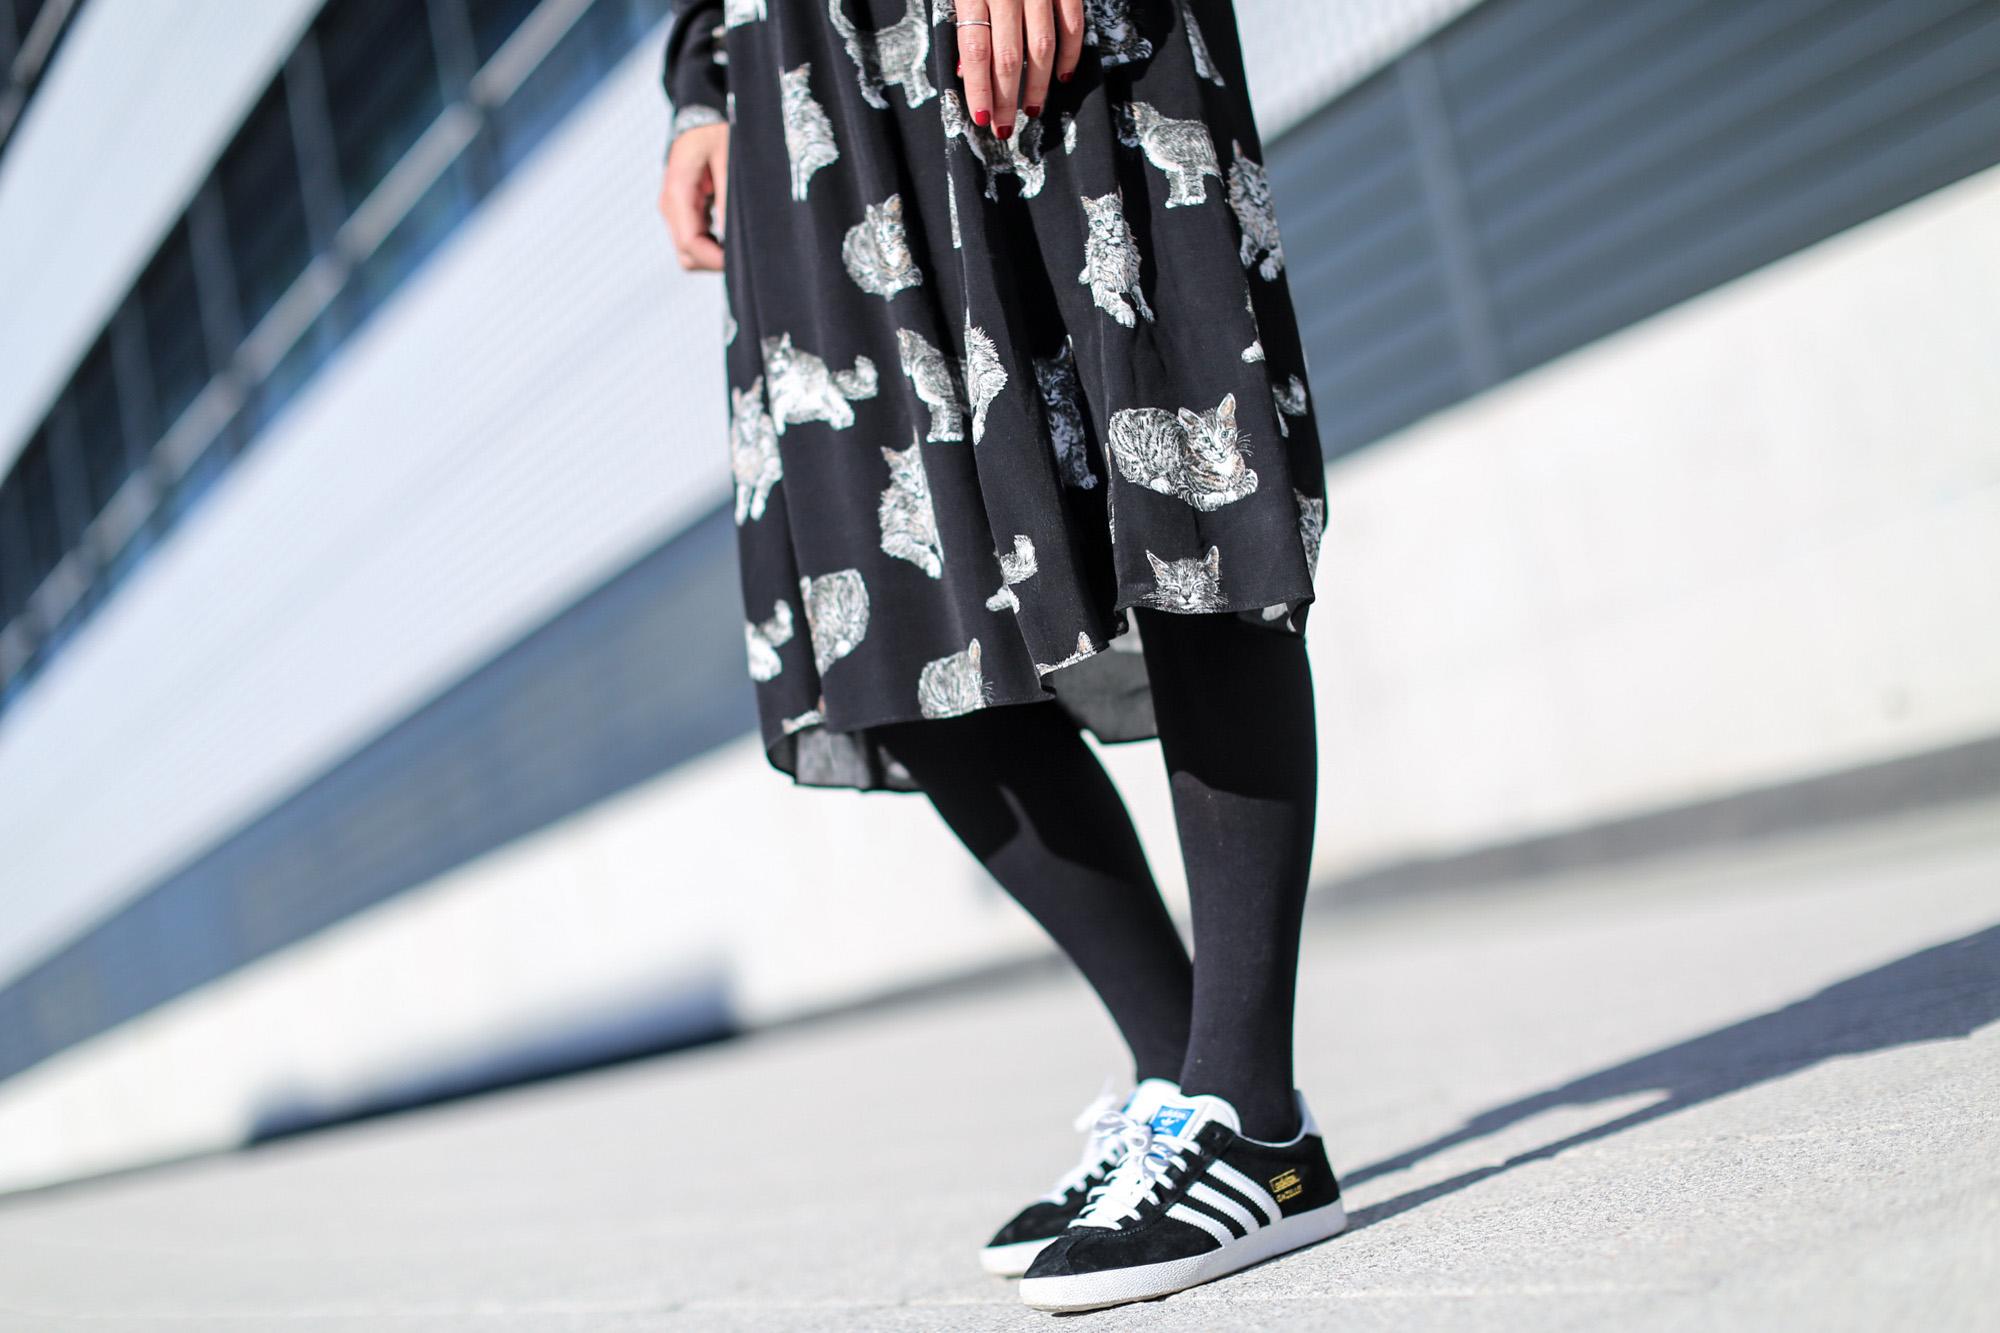 Clochet_fashionblogger_streetstyle_zaracatsprintdmididress_coslongwoolcoat_adidasgazelle_titamadridspiga-7